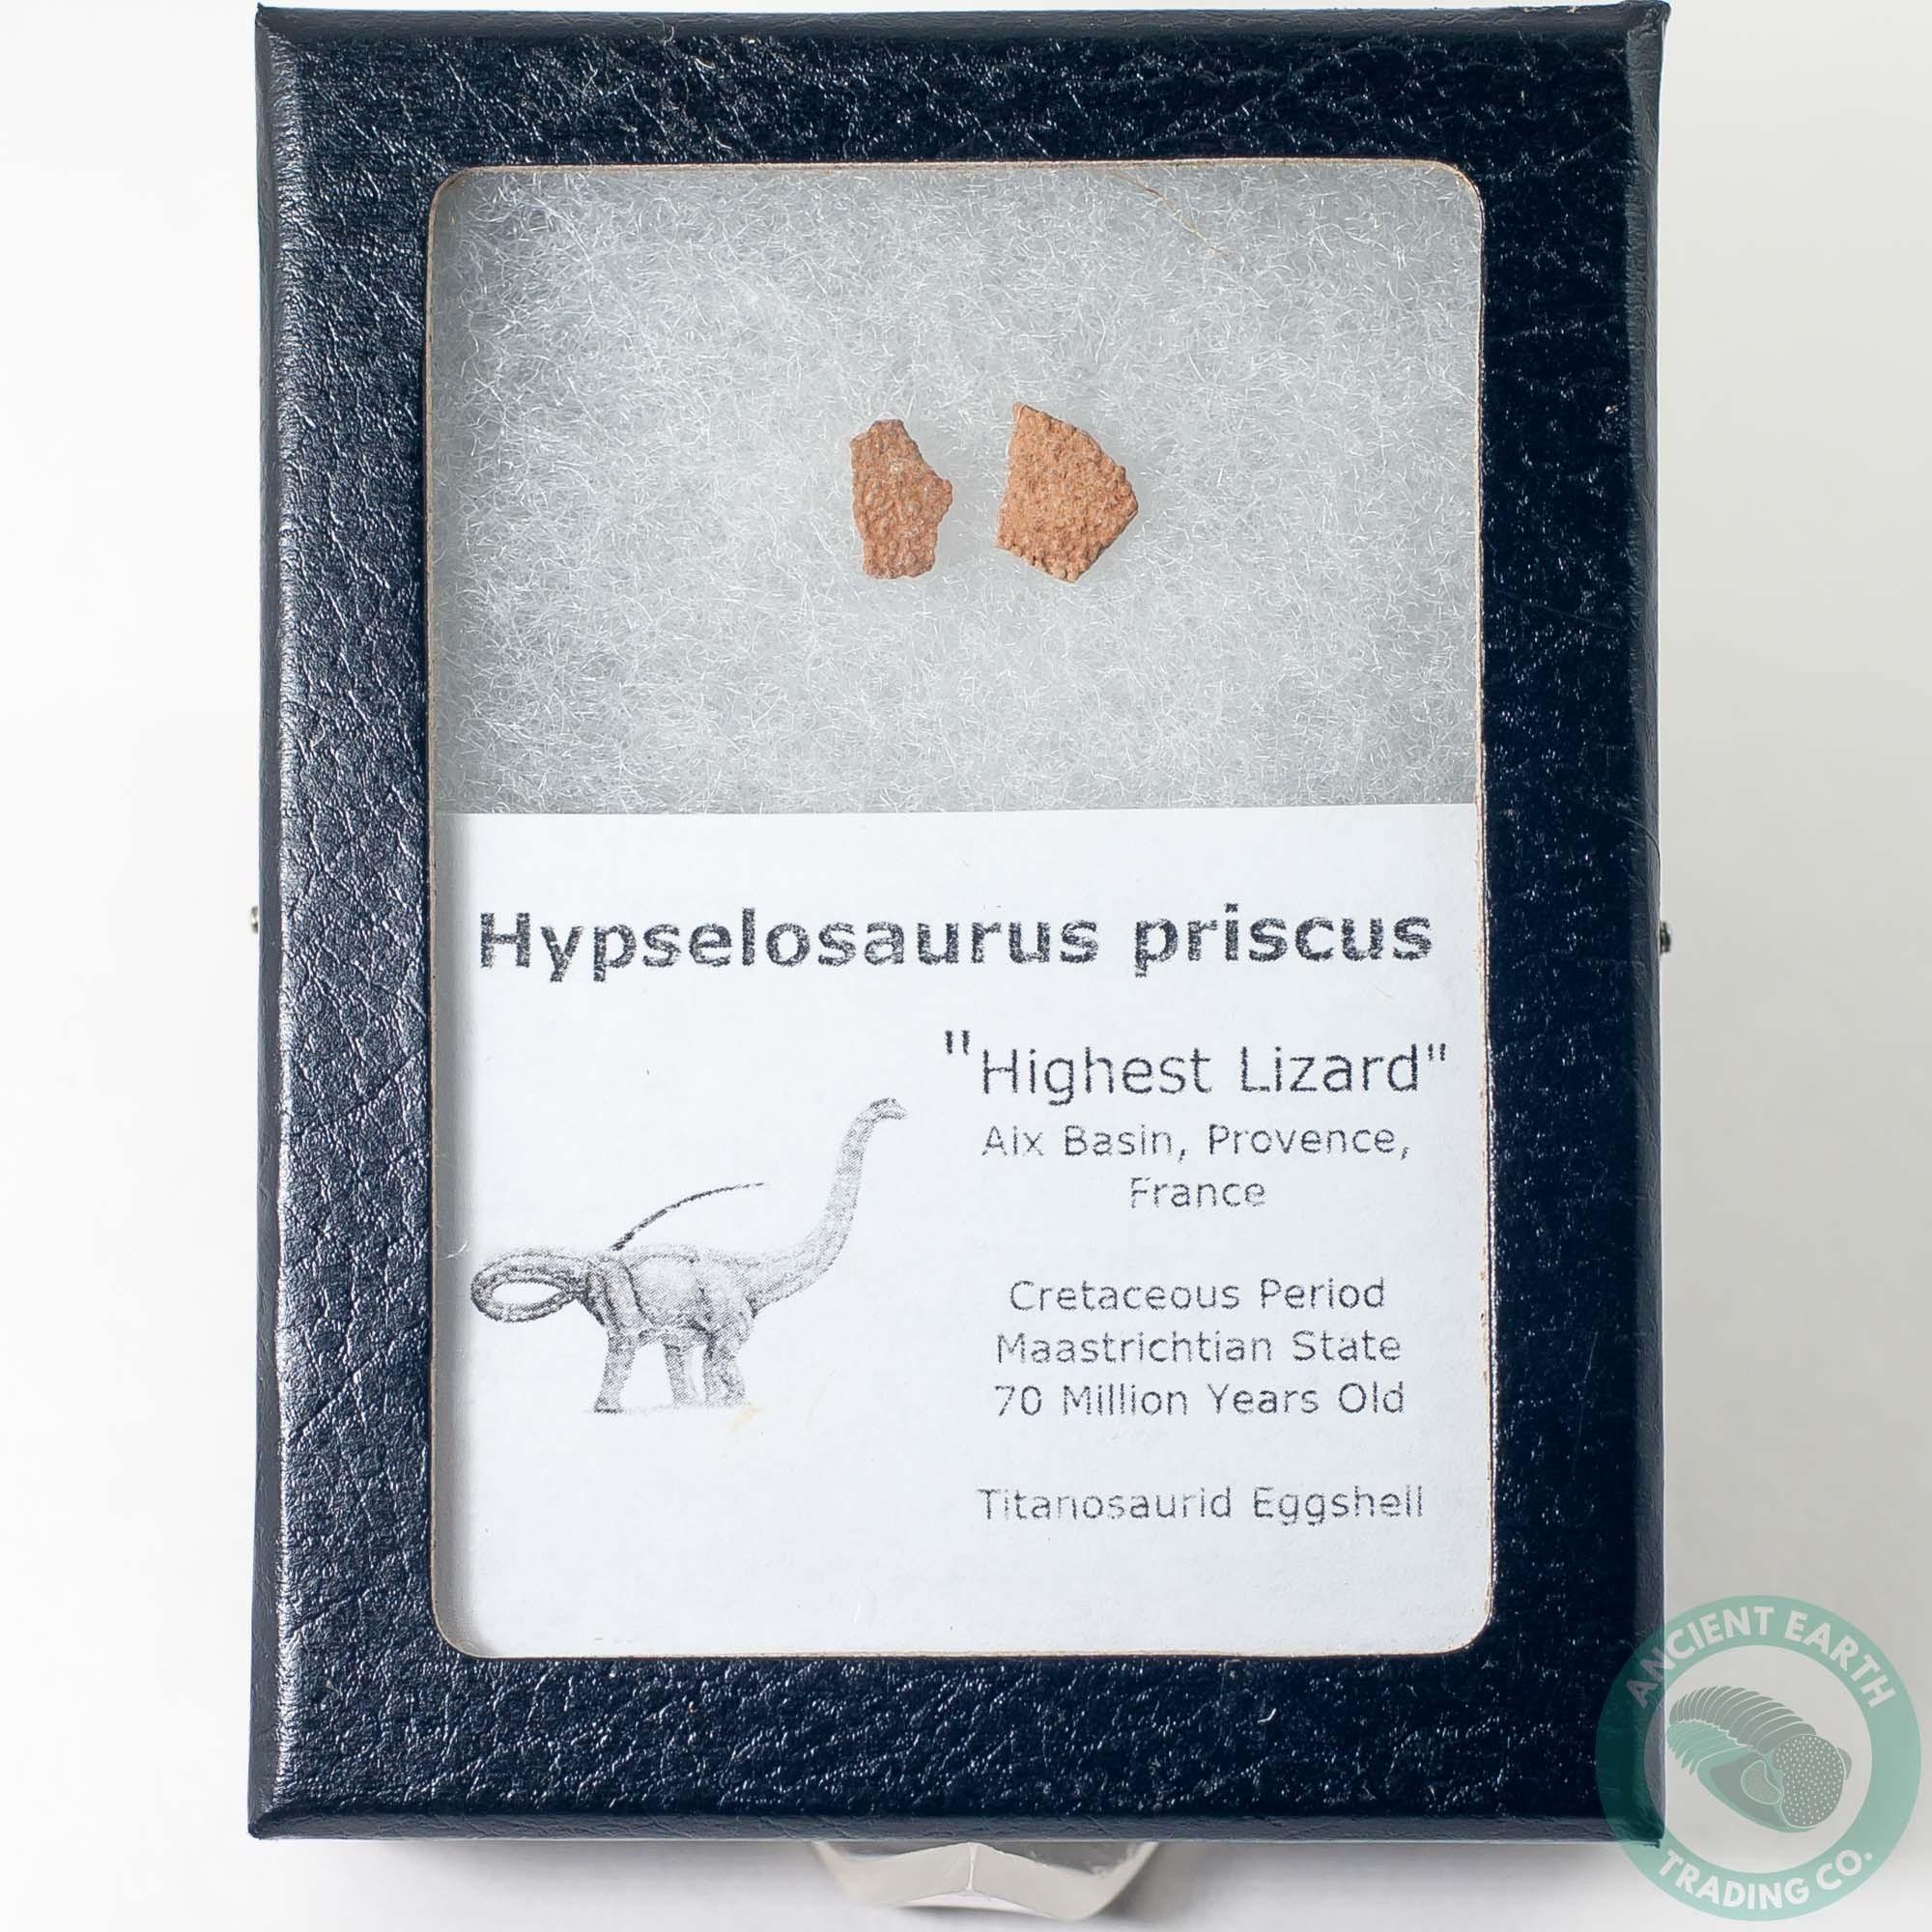 Hypselosaurus Titanosaur Dinosaur Egg Shell Fossil 4 - France